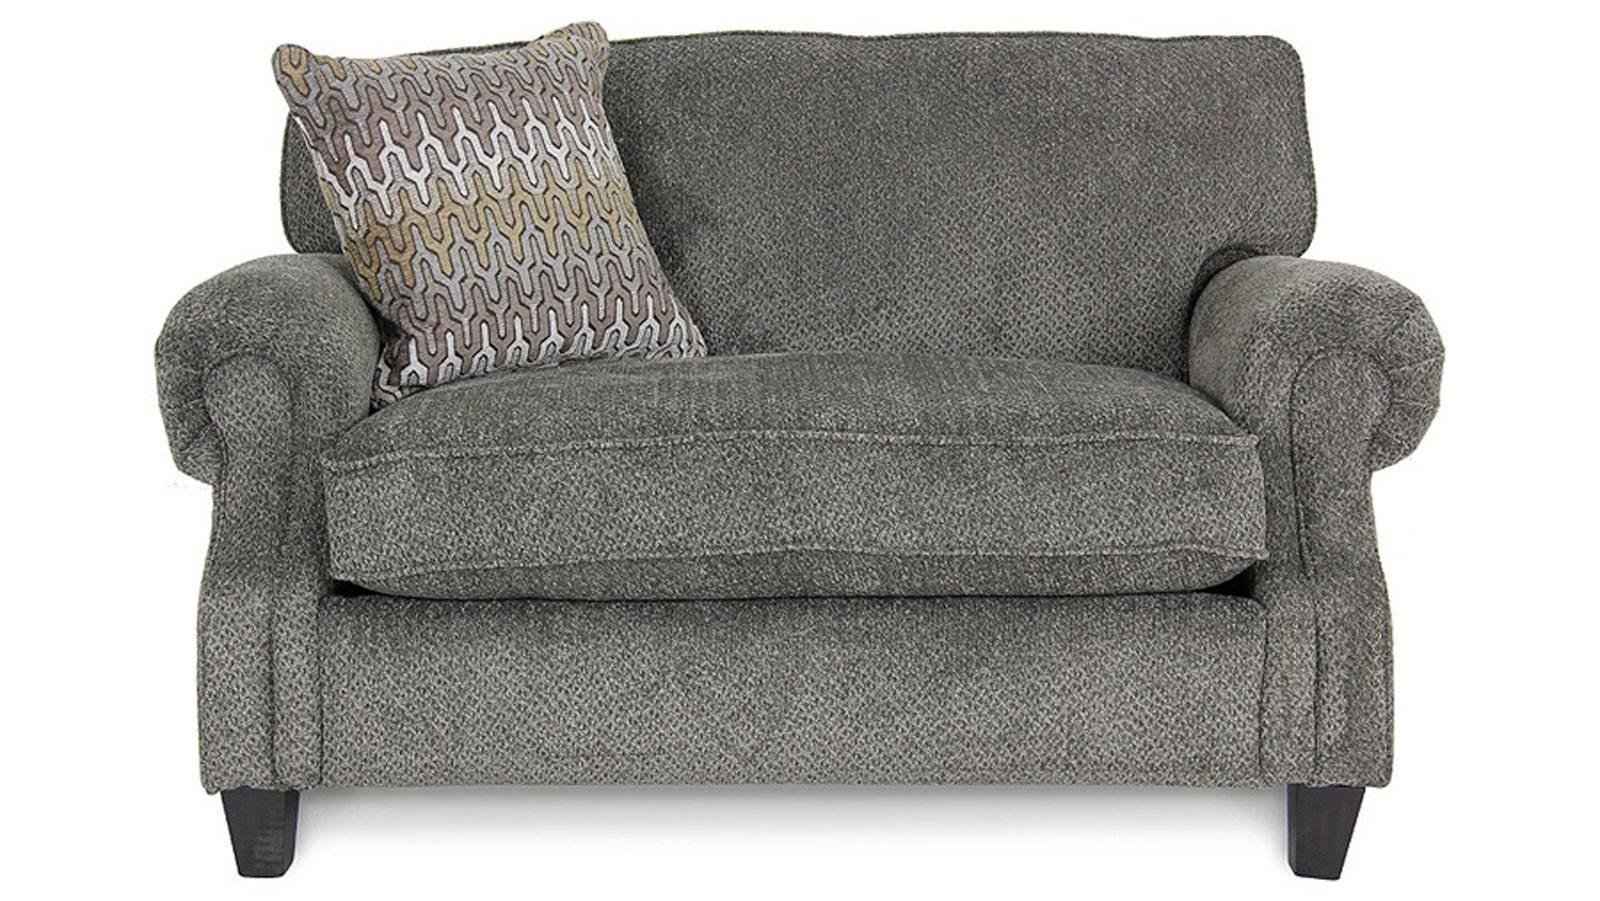 Sweet Dreams Twin Sleeper | Gallery Furniture throughout Loveseat Twin Sleeper Sofas (Image 25 of 30)